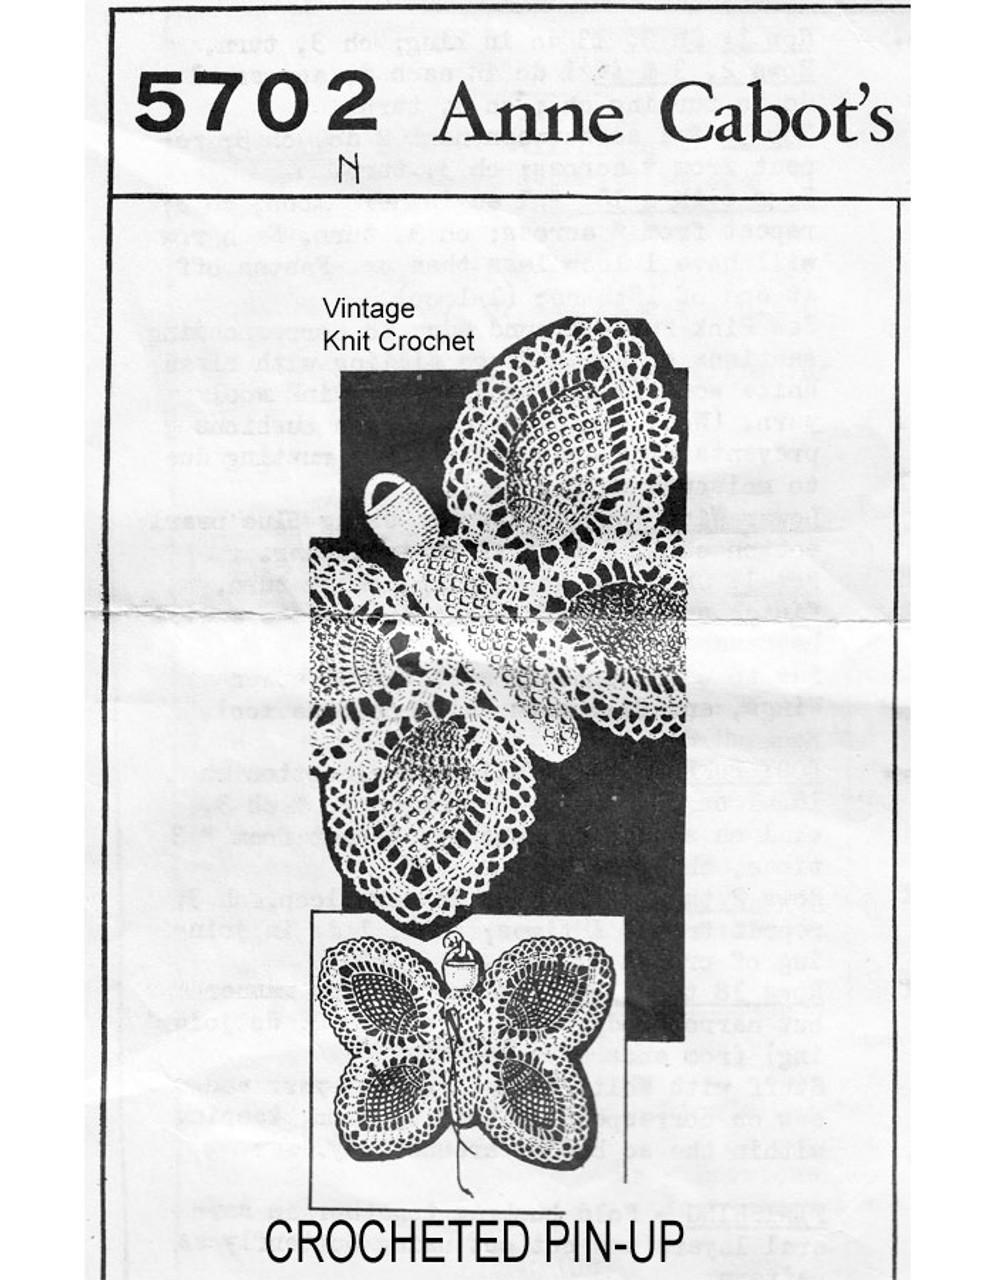 Pineapple Butterfly Pincushion Crochet Pattern No 5702